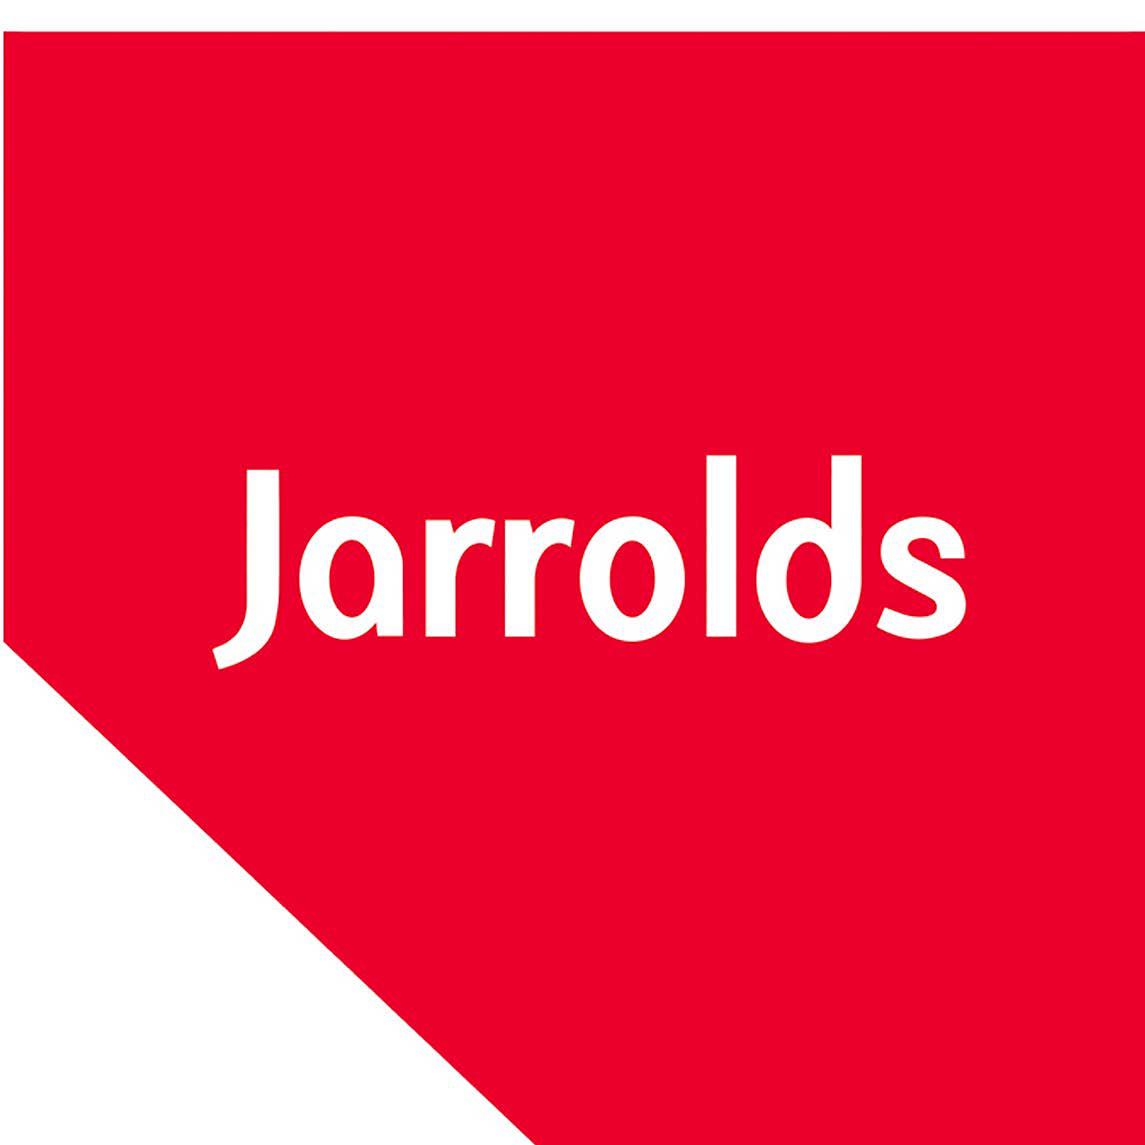 Jarrolds